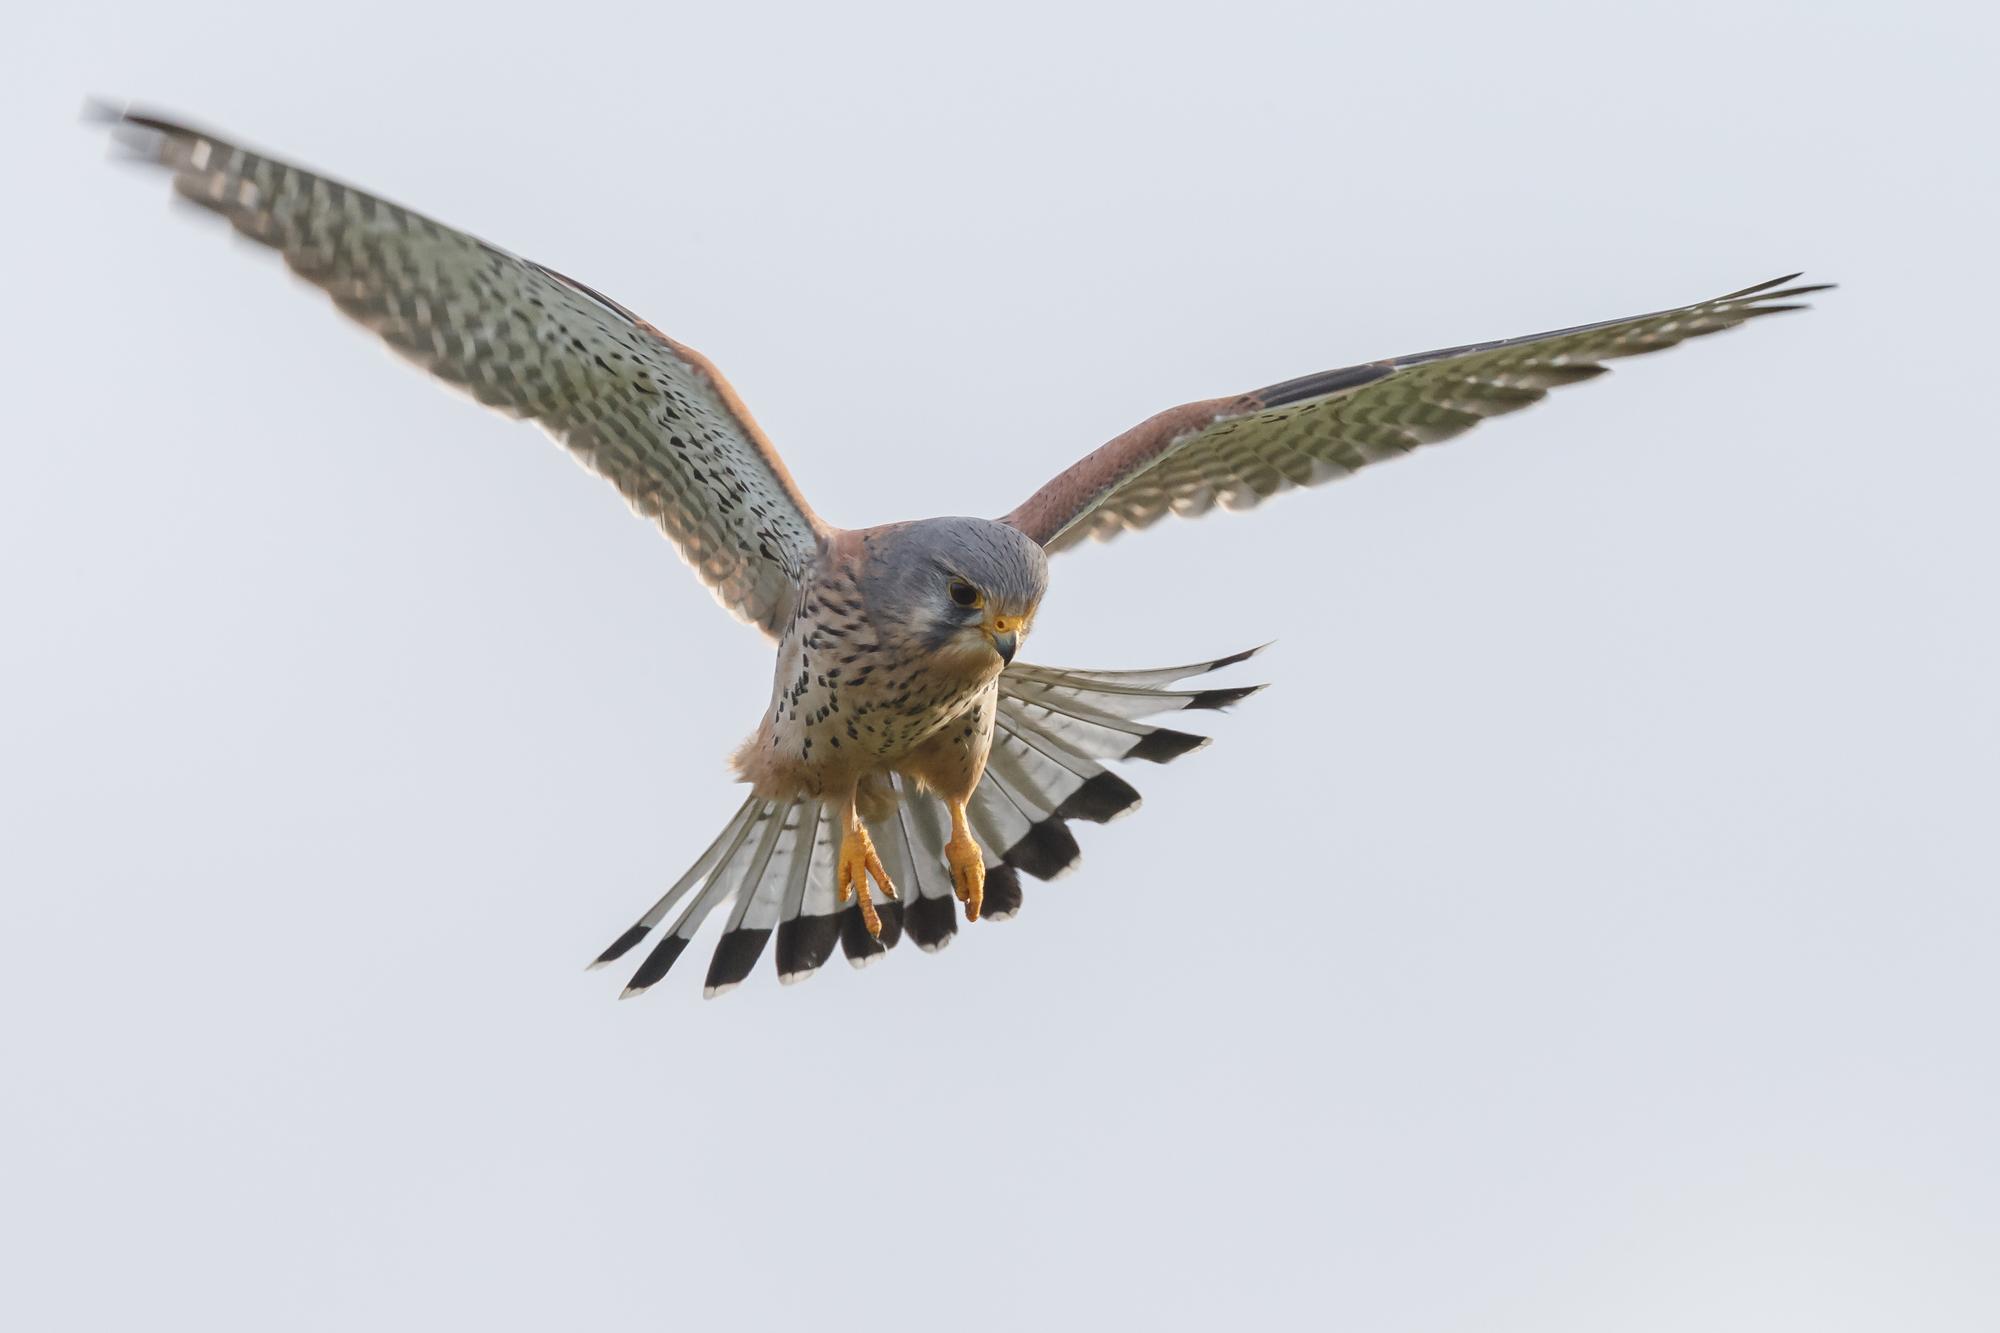 European common Kestrel in flight